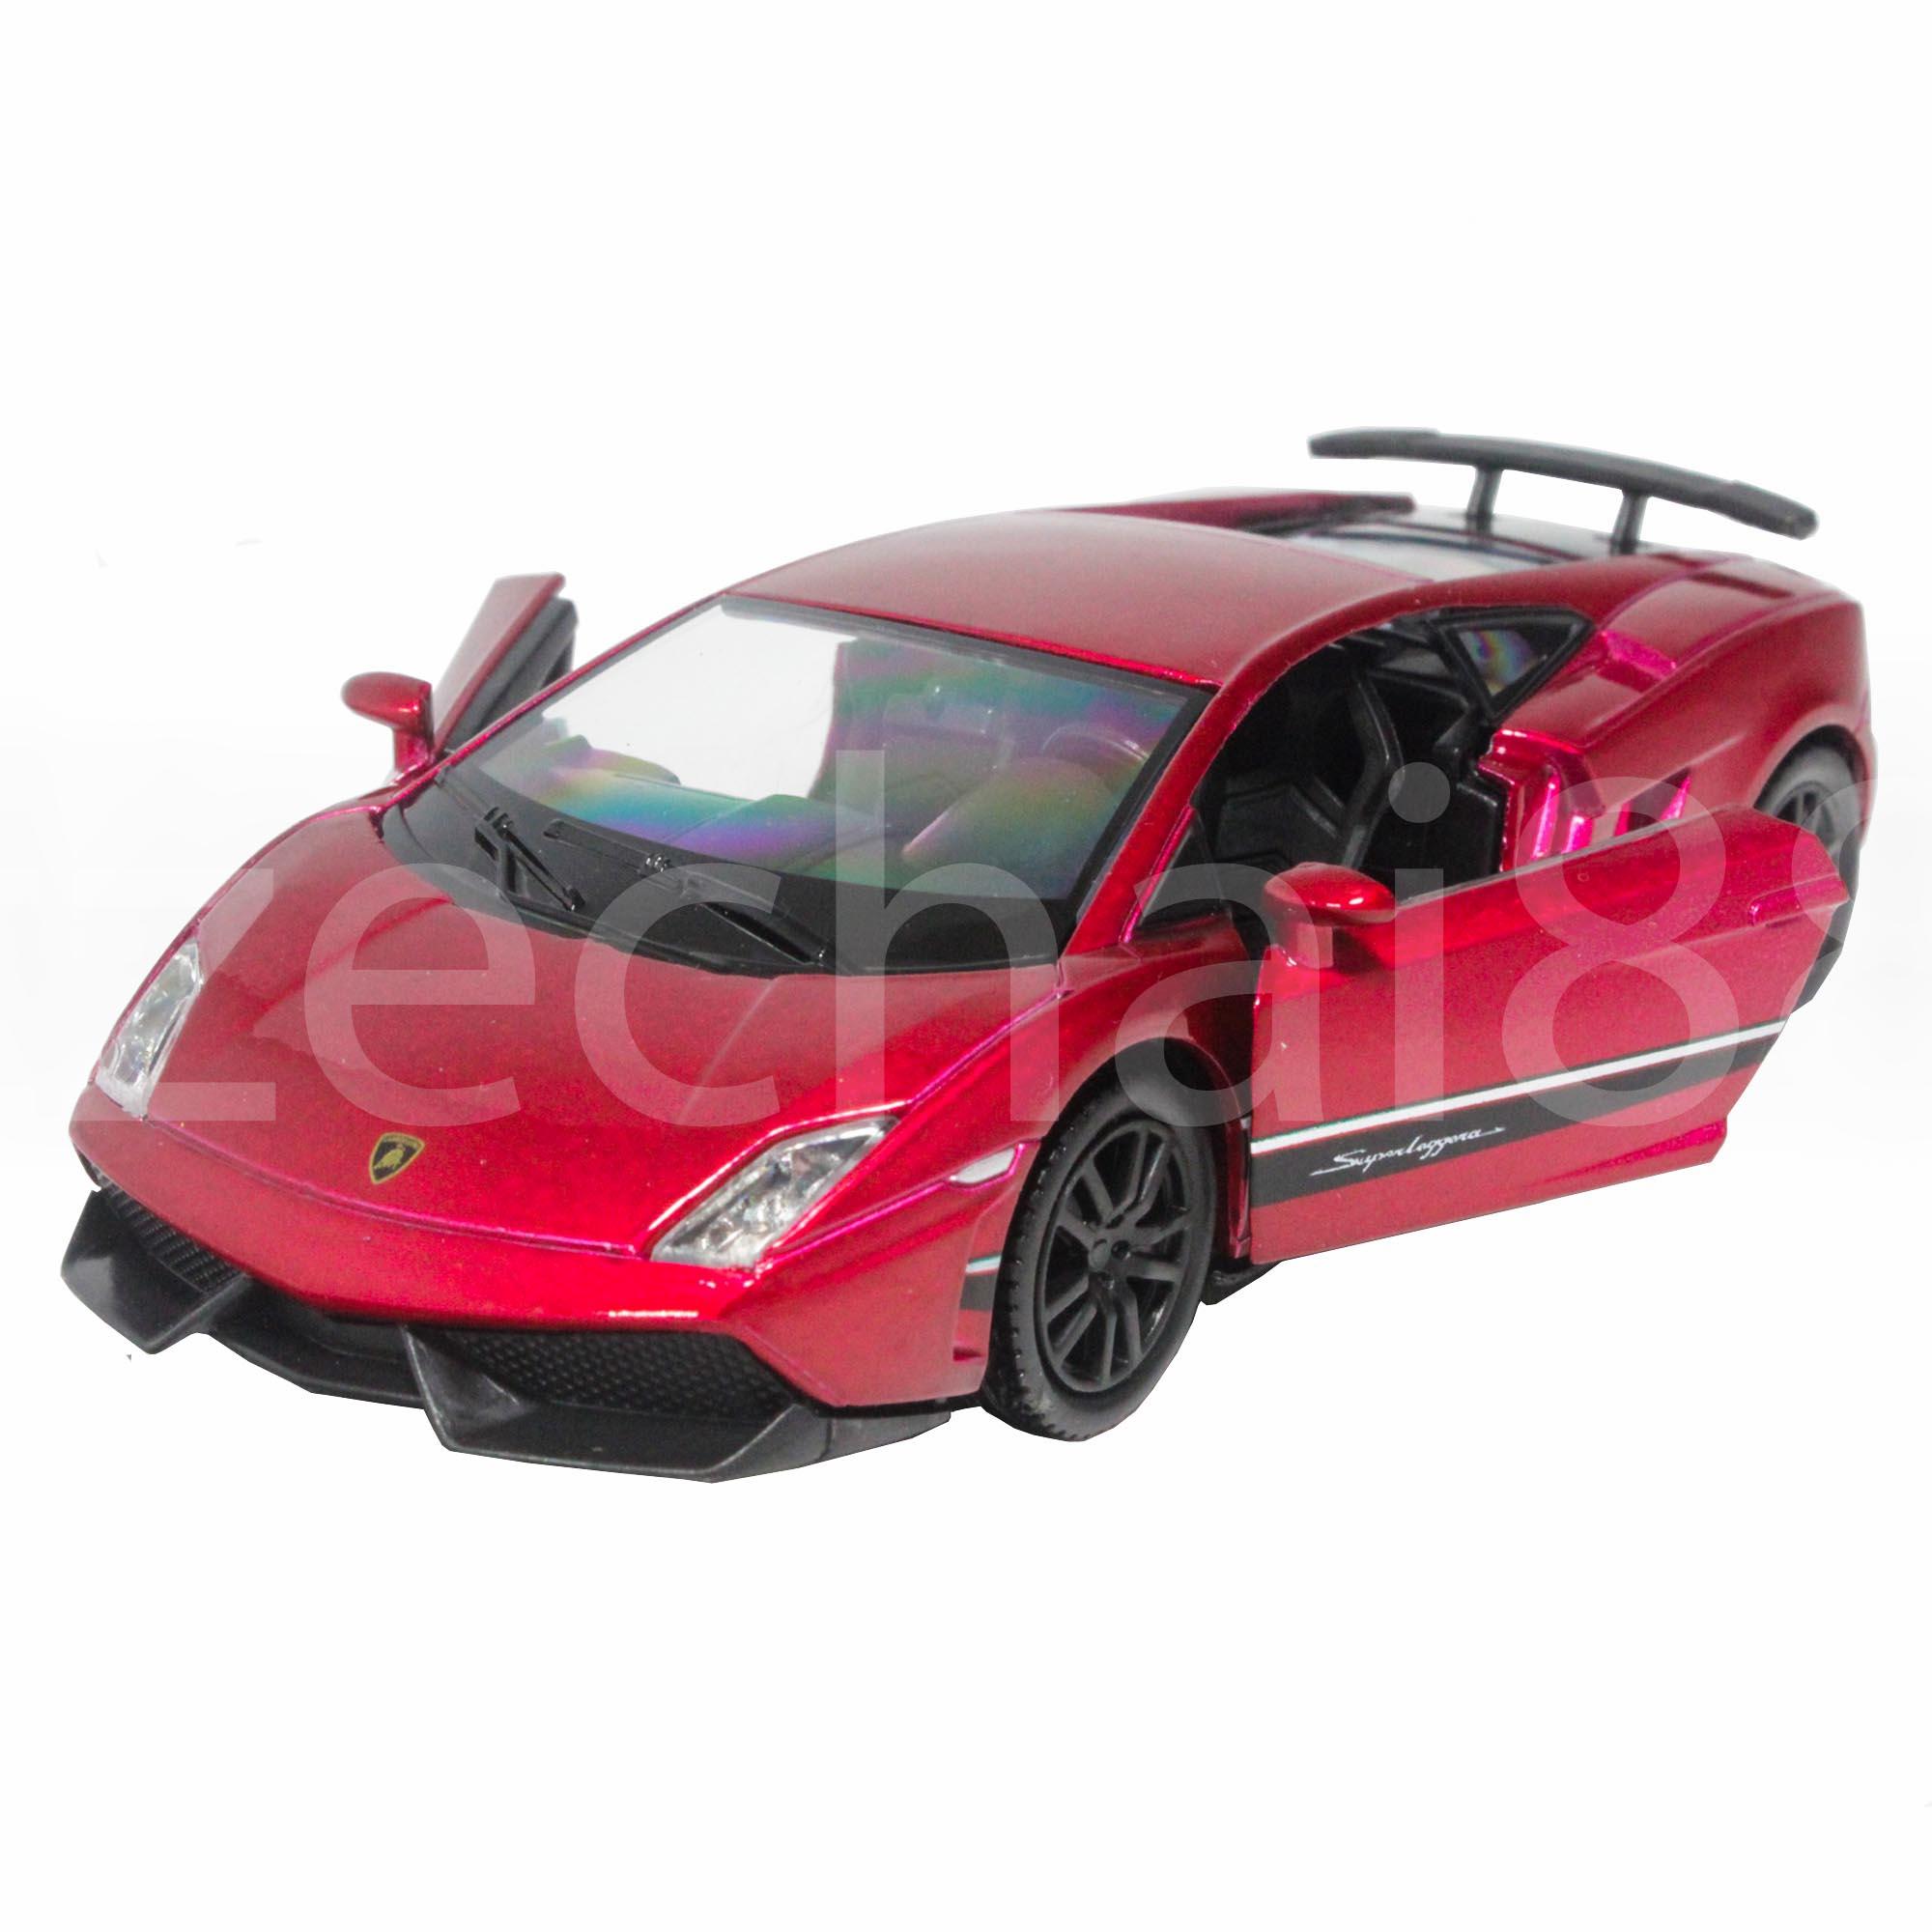 RMZ City 1:32 Die Cast Lamborghini Gallardo LP 570 4 Superleggera Car